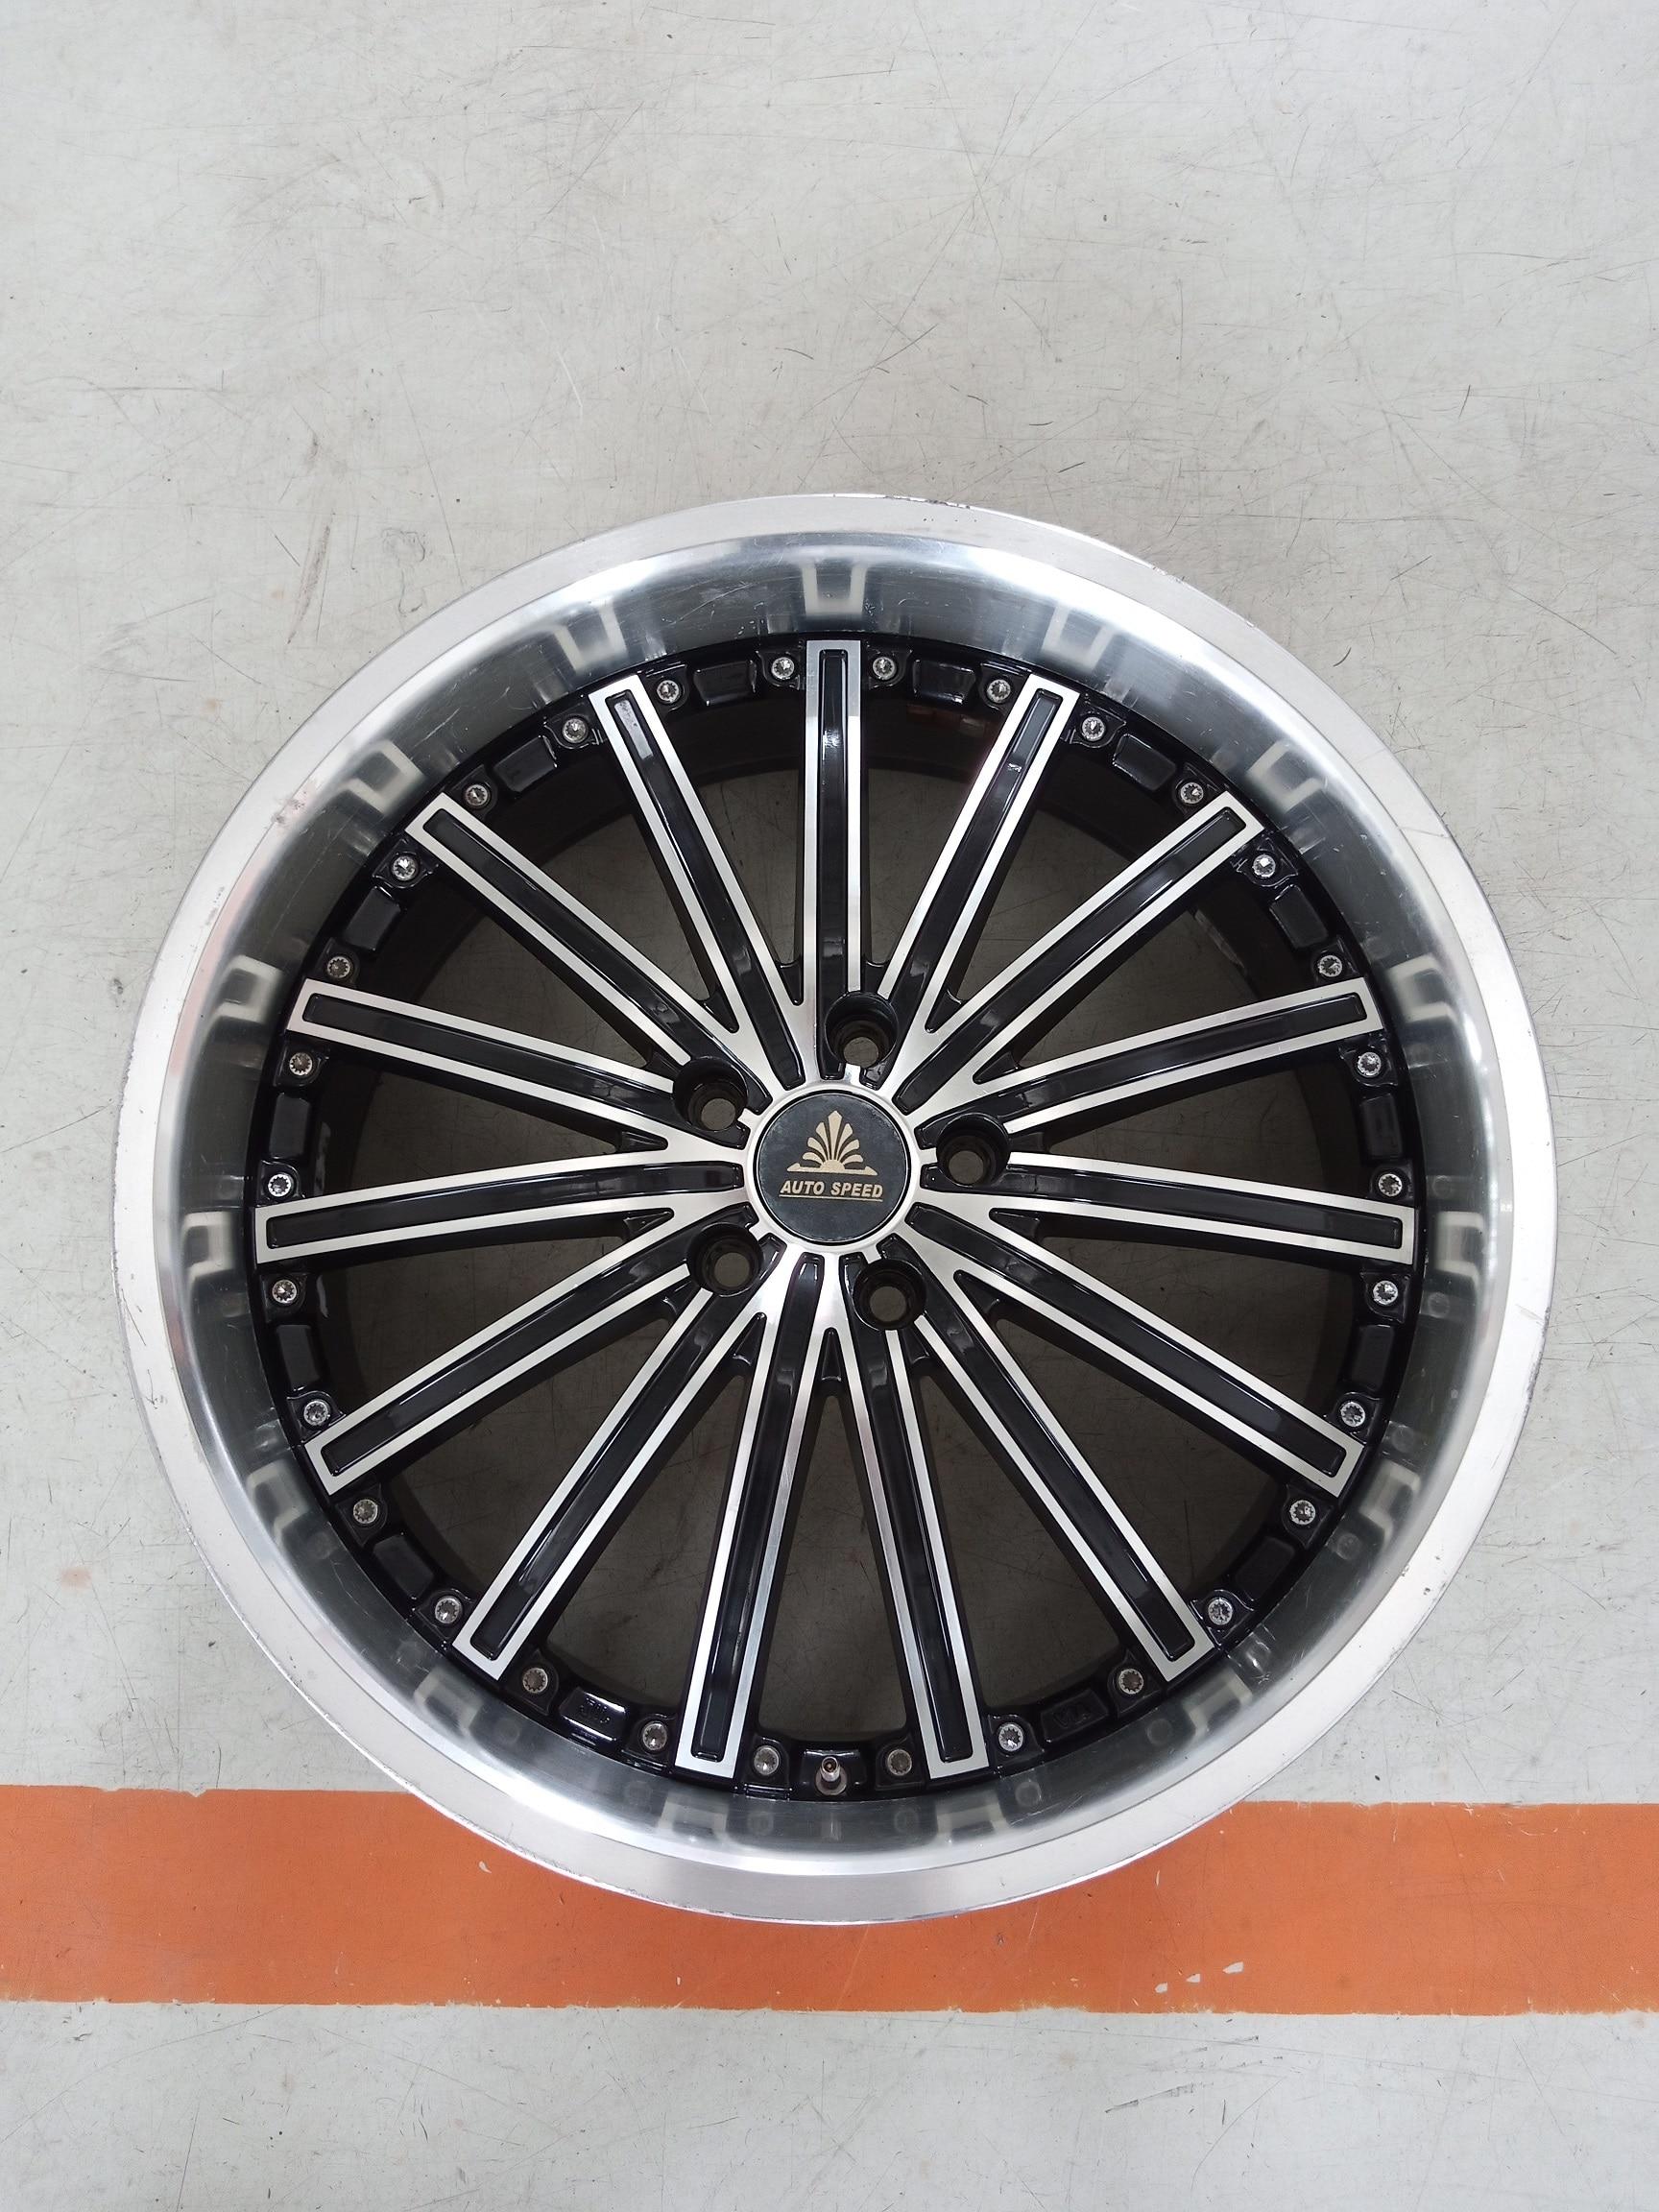 Velg Bekas Racing Type Auto Speed Ring 20 *Buat : Innova,Vitara,CR-V,HR-V